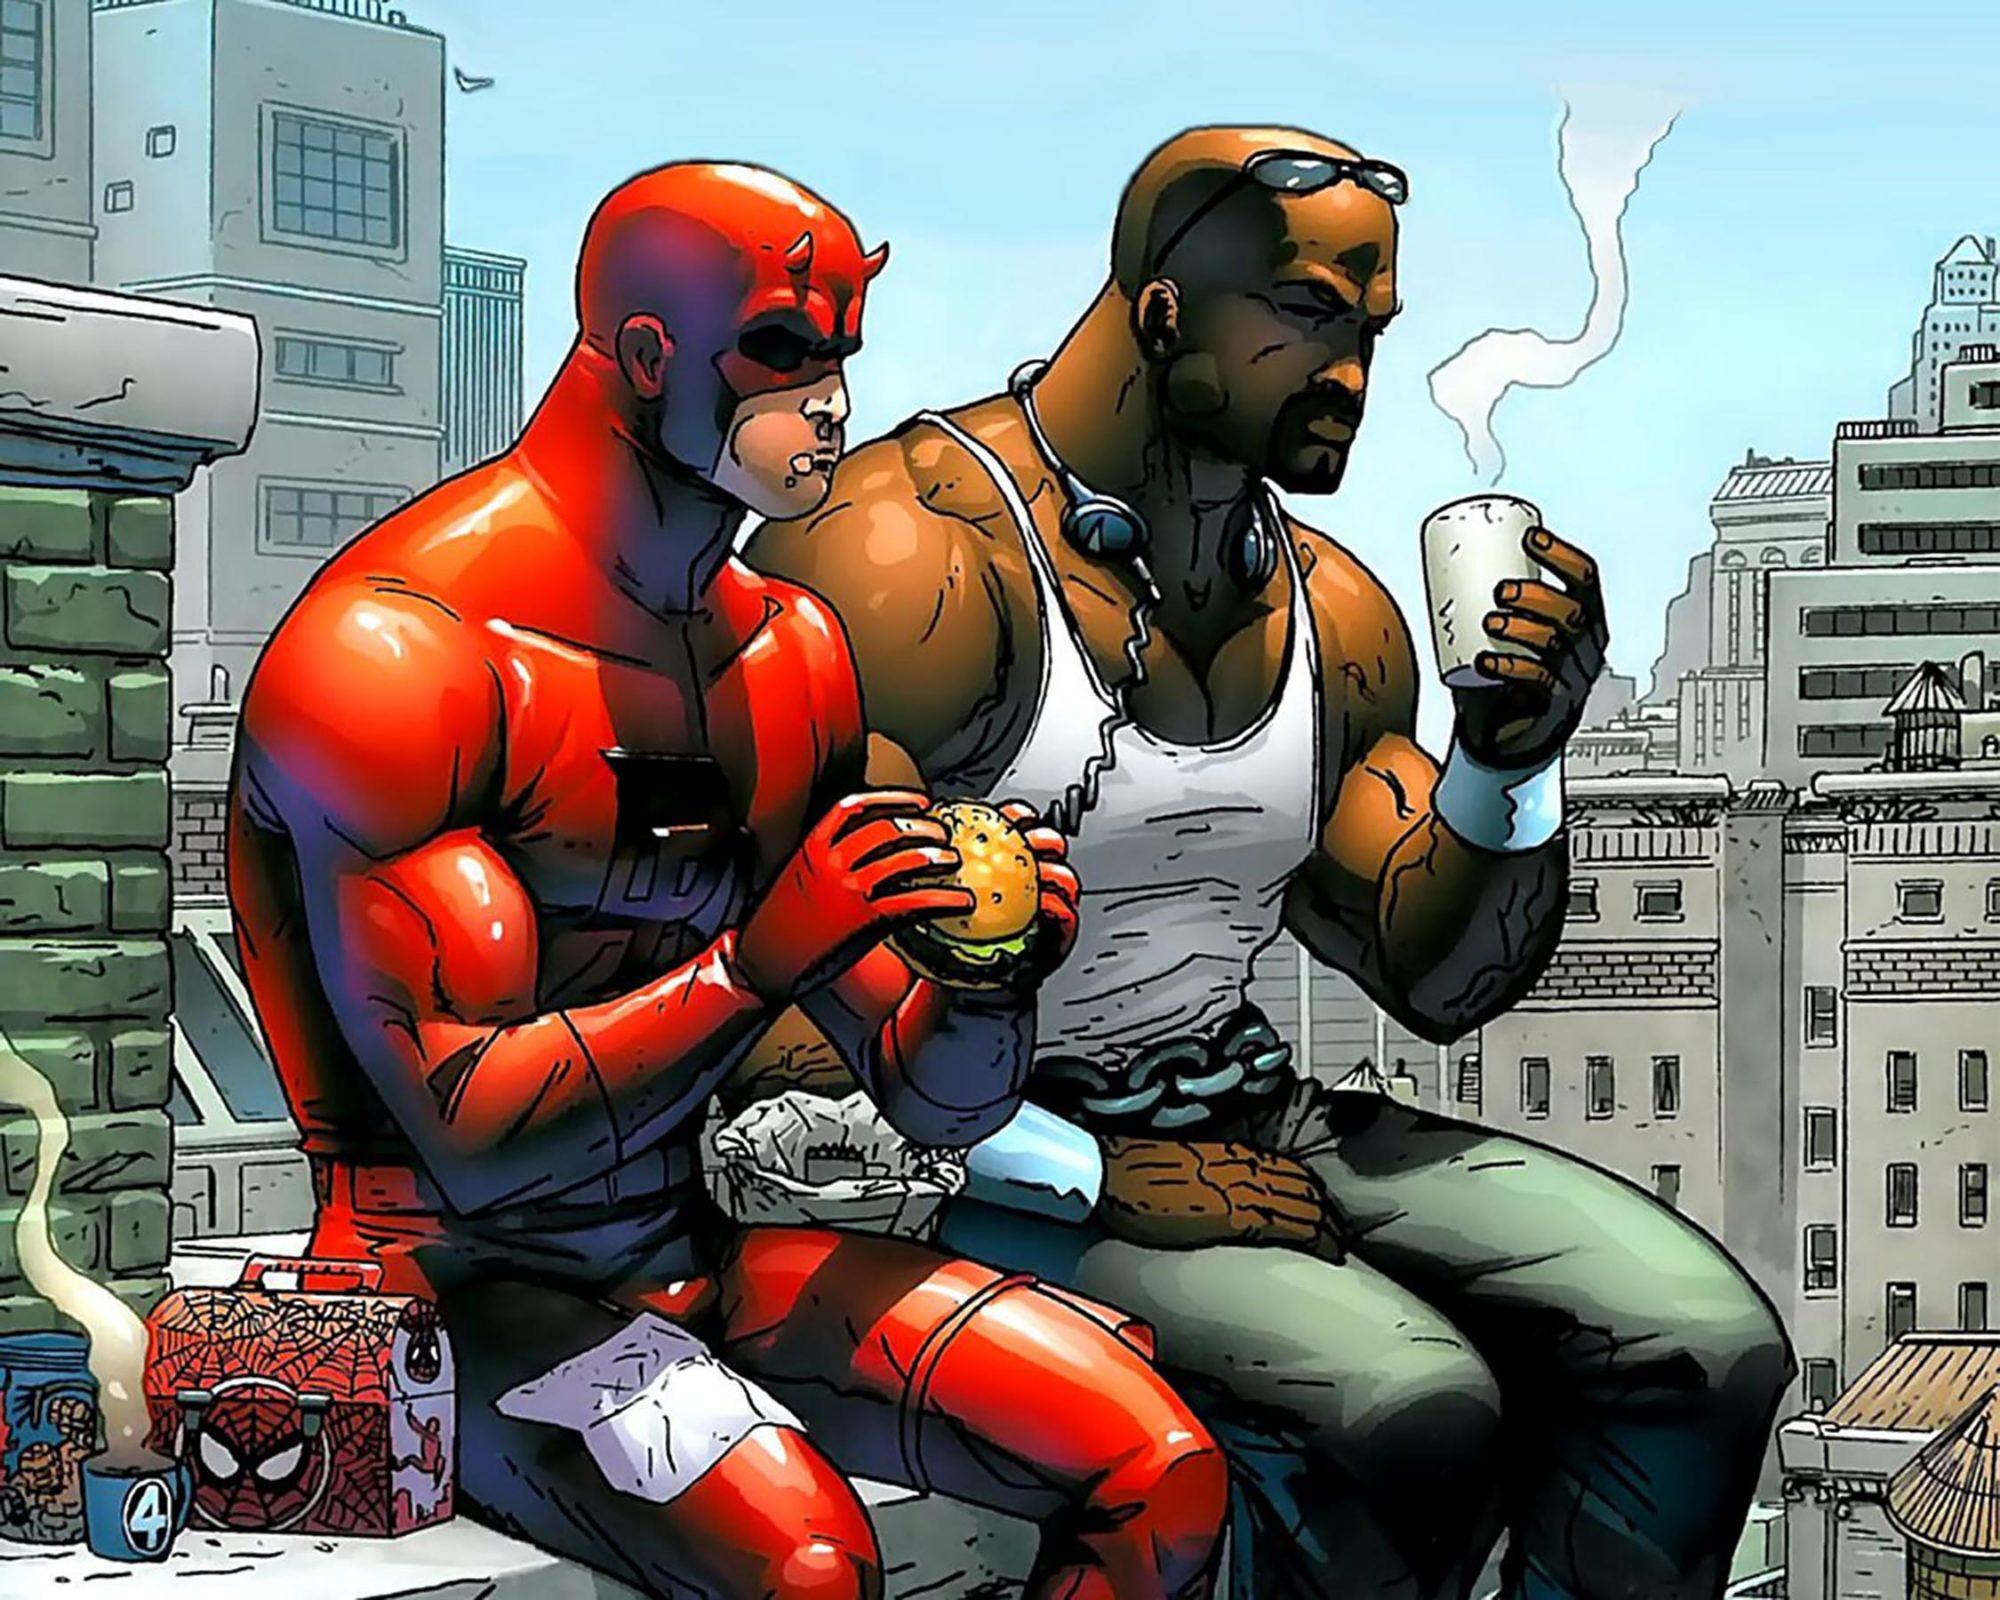 Daredevil and Luke Cage CR: Marvel